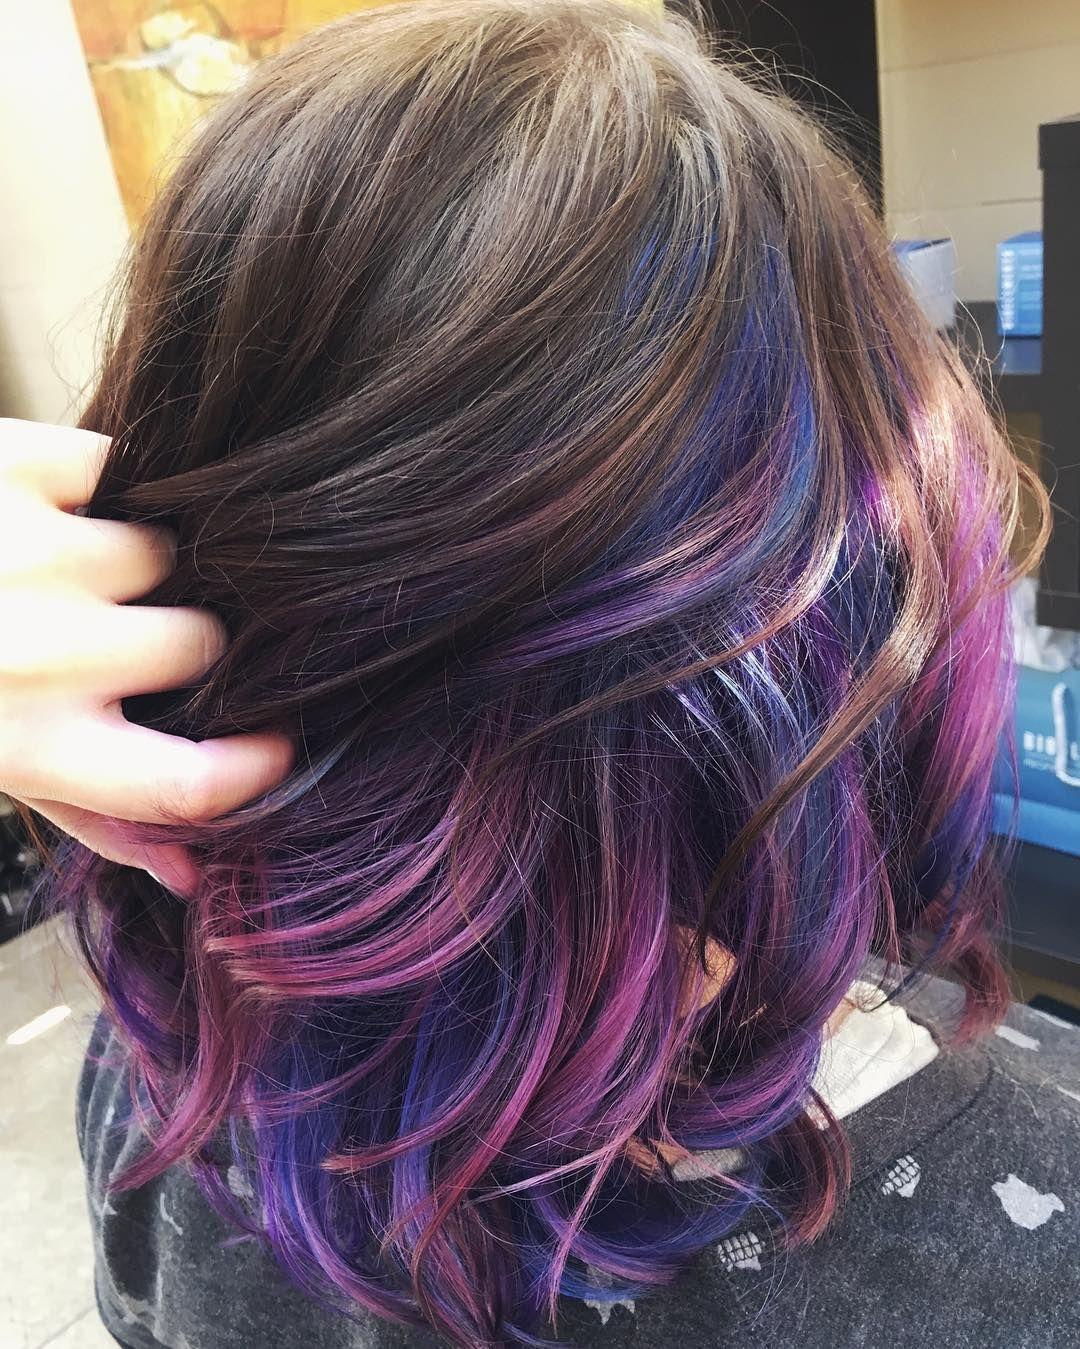 Galaxy Under Lights Hair Do Pinterest Cabelo Cabelo